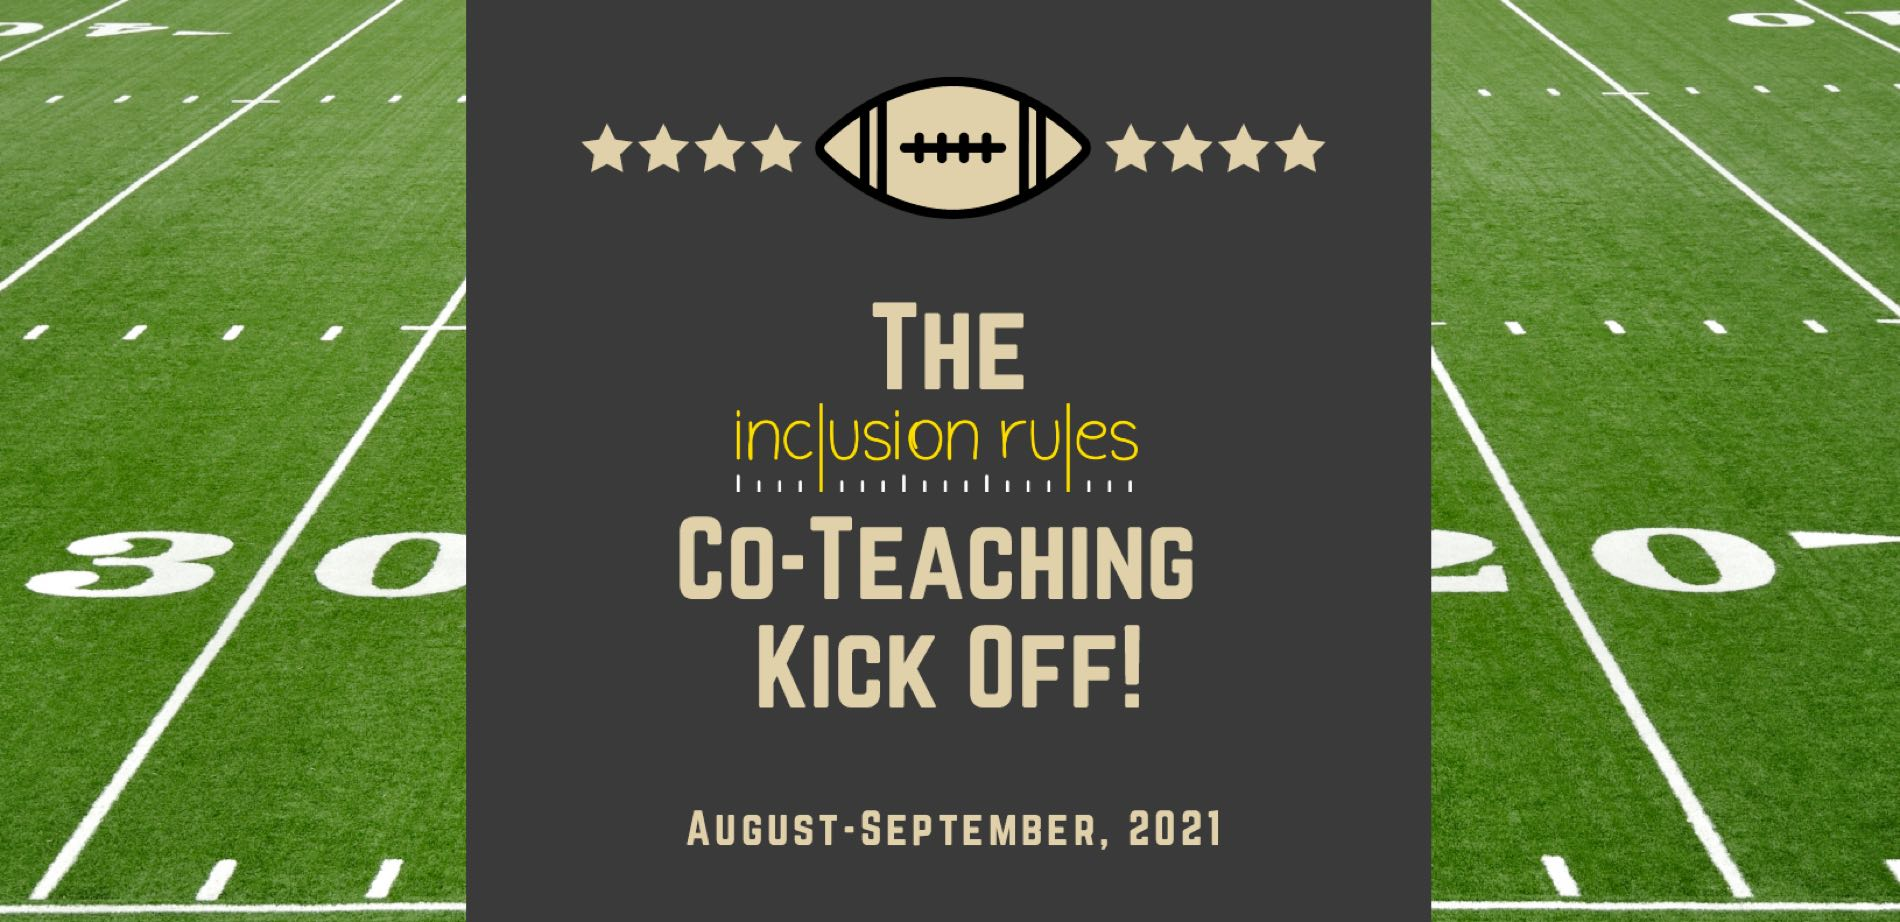 Co-Teaching Kick Off Banner